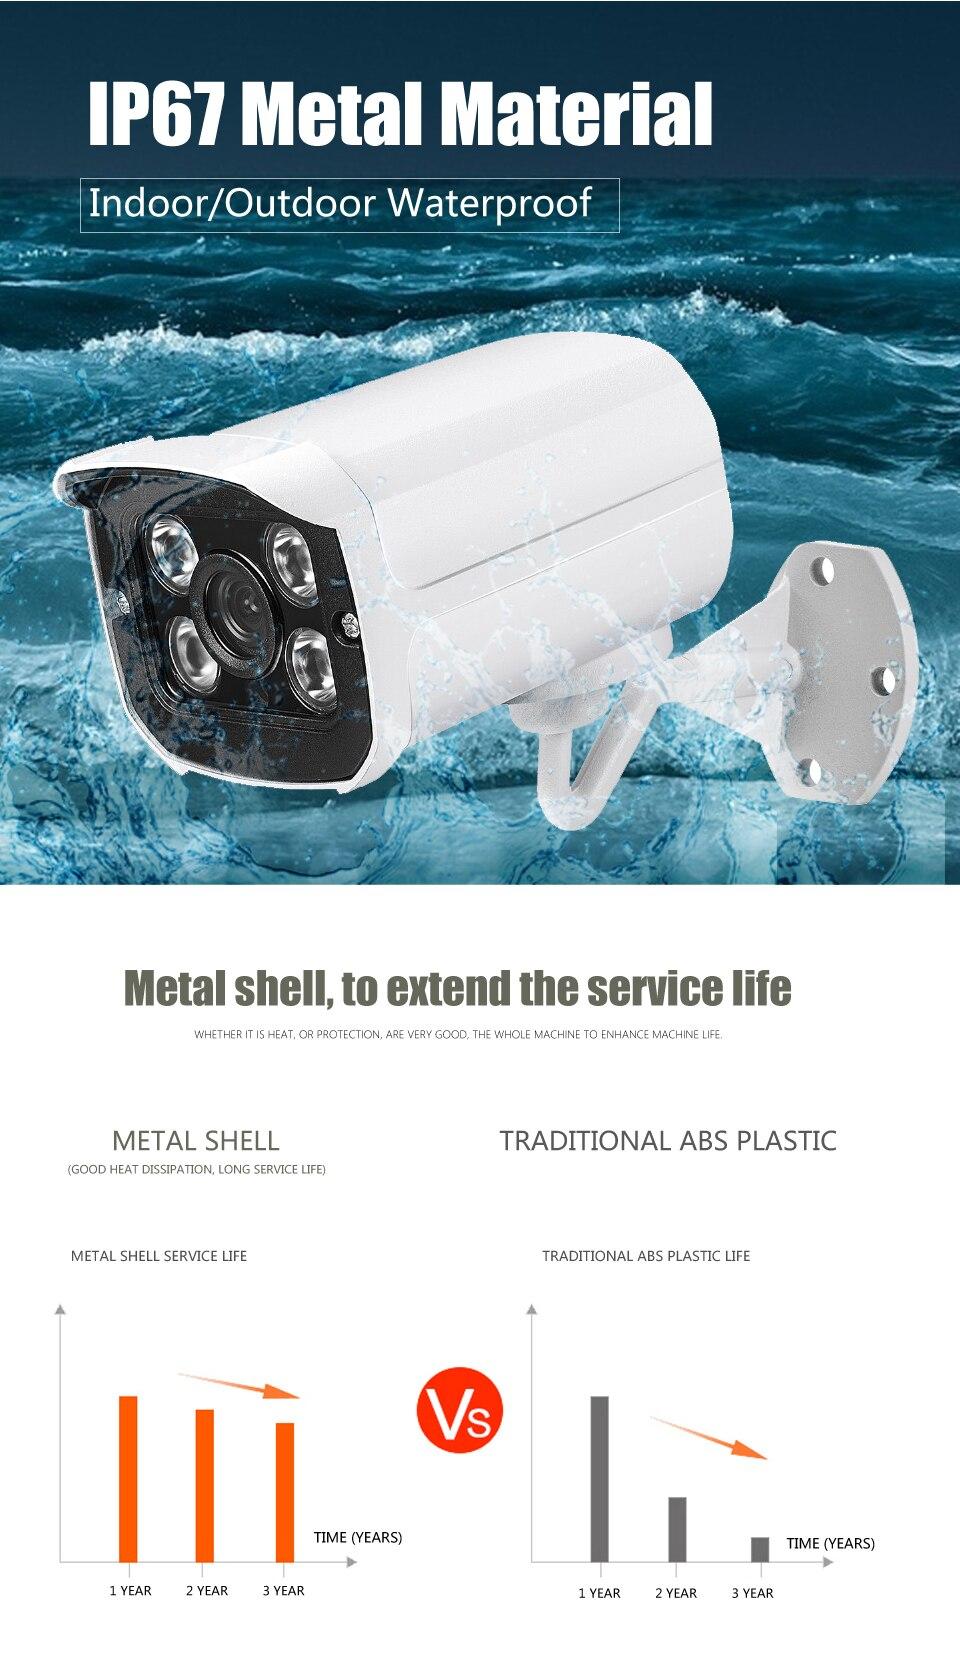 BESDER Wide Angle 2.8mm Outdoor IP Camera PoE 1080P 960P 720P Metal Case ONVIF Security Waterproof IP Camera CCTV 4PCS ARRAY LED